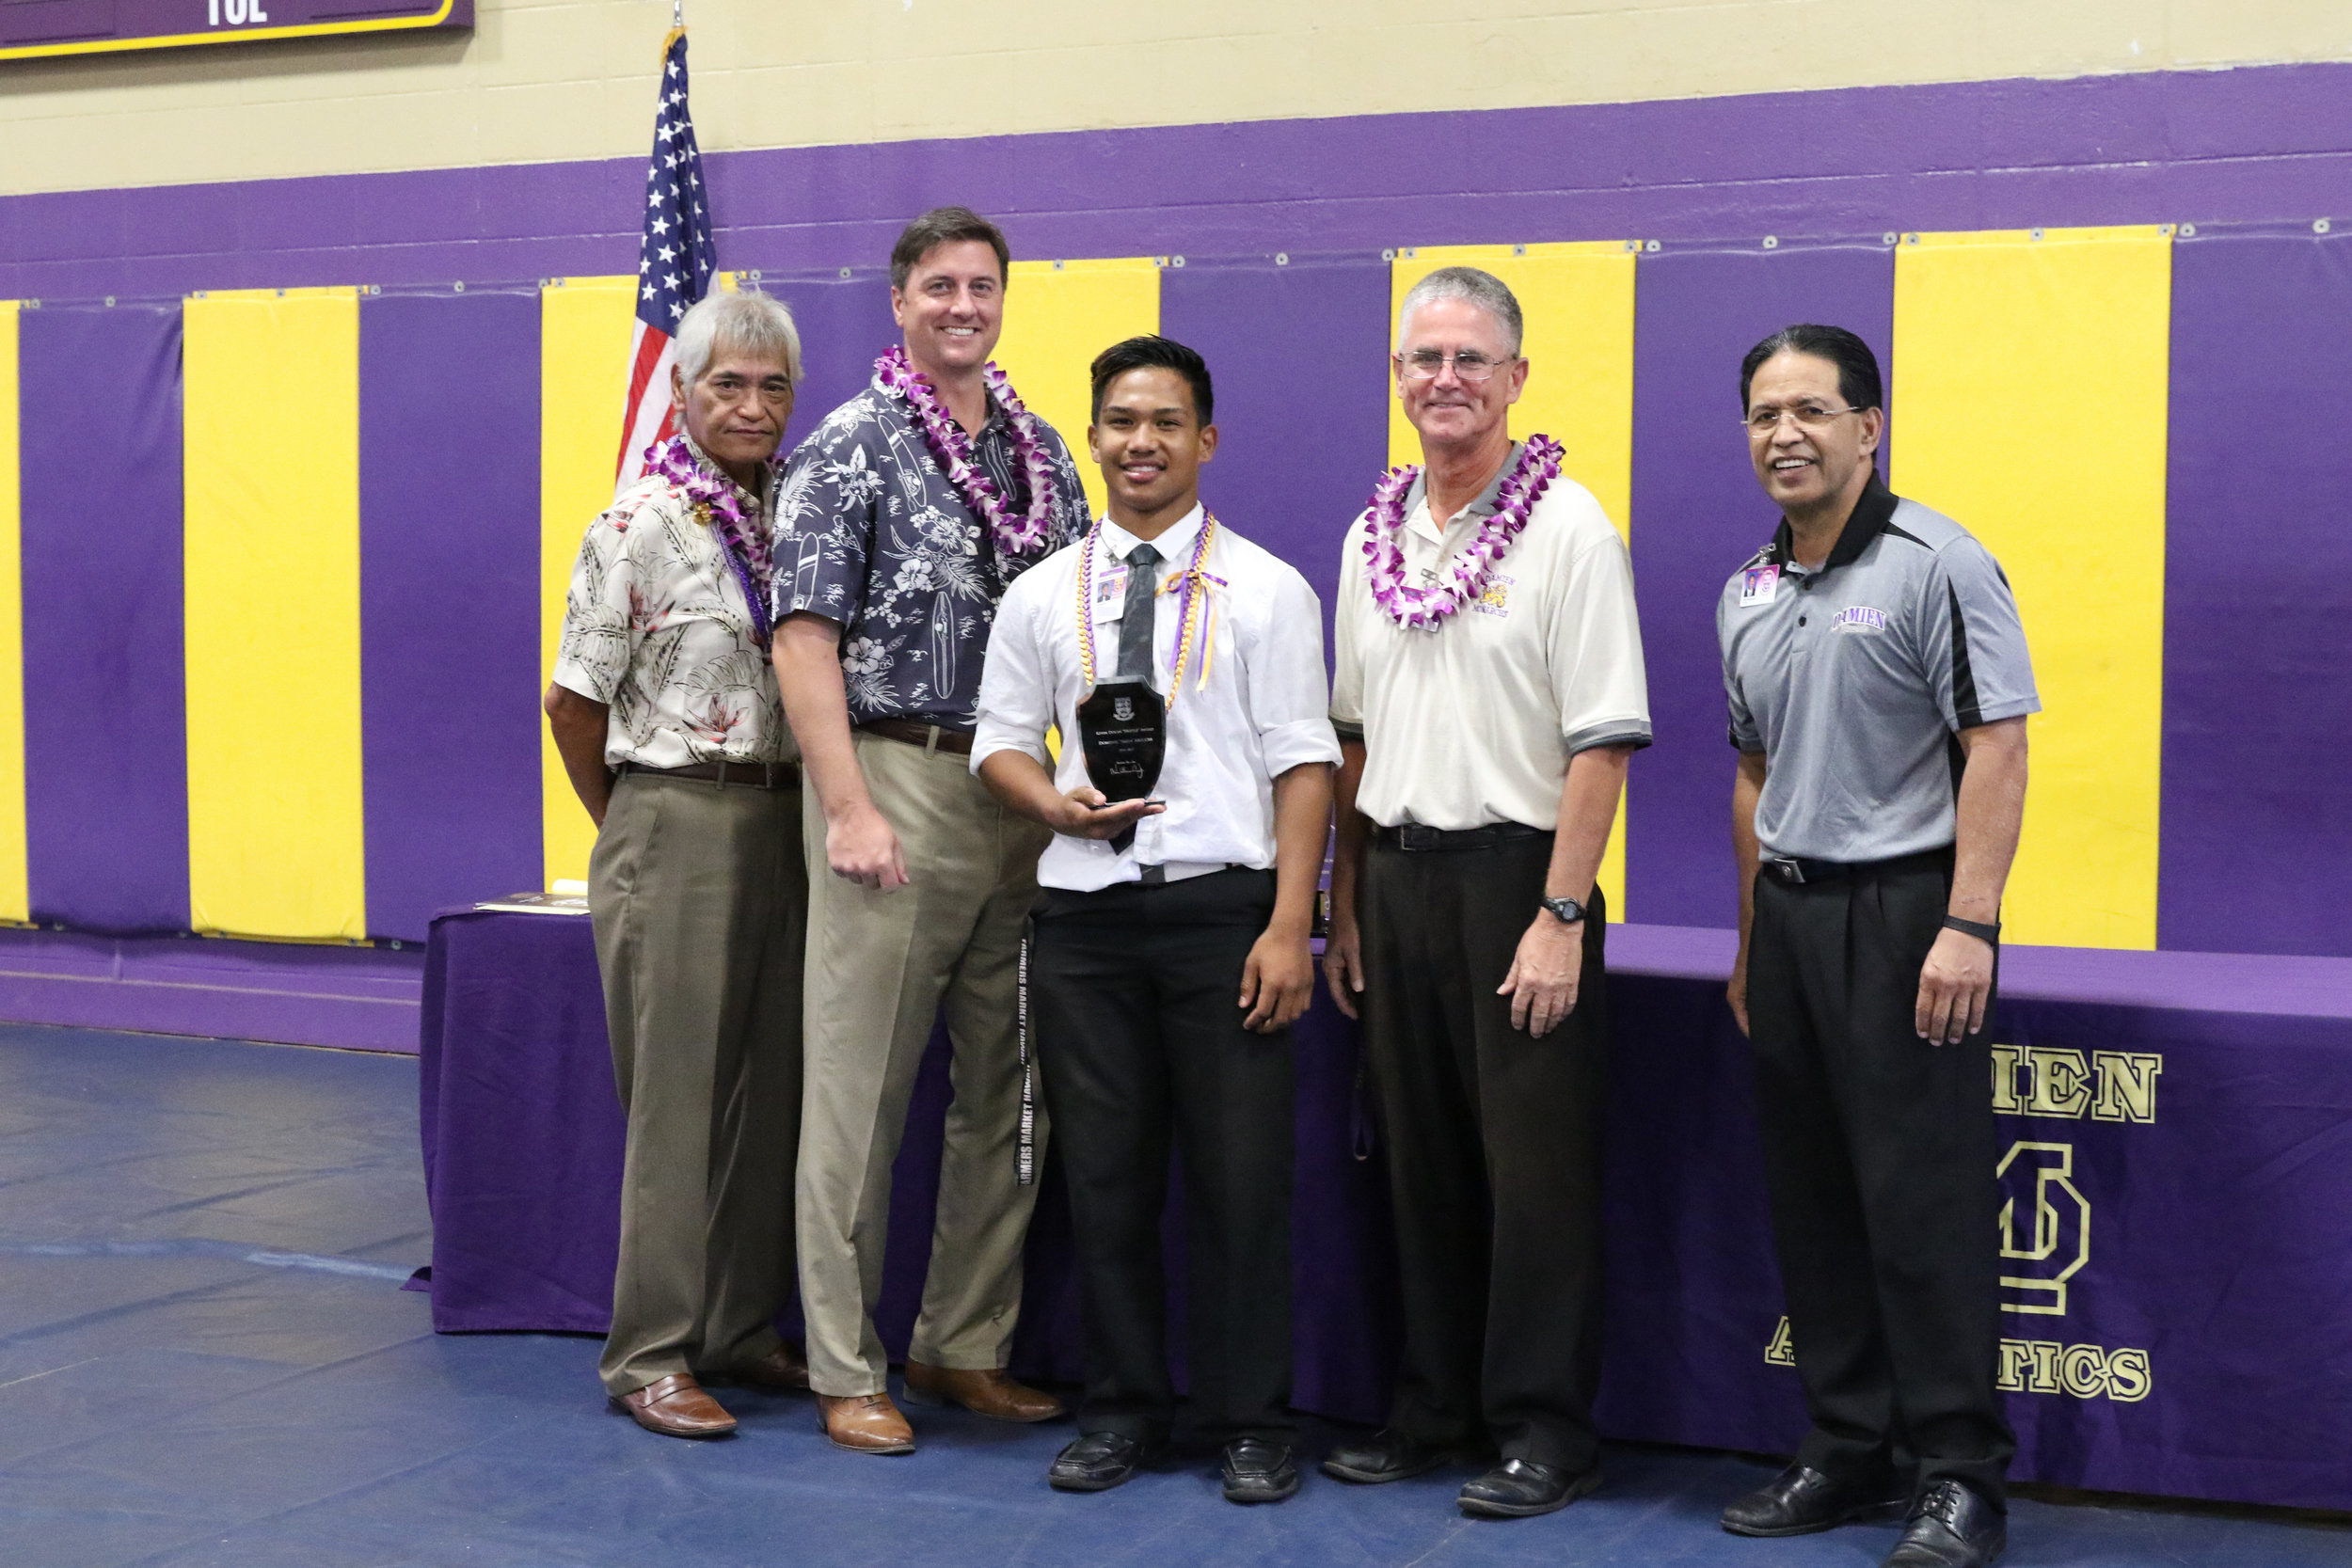 Kevin Dolan Hustle Award